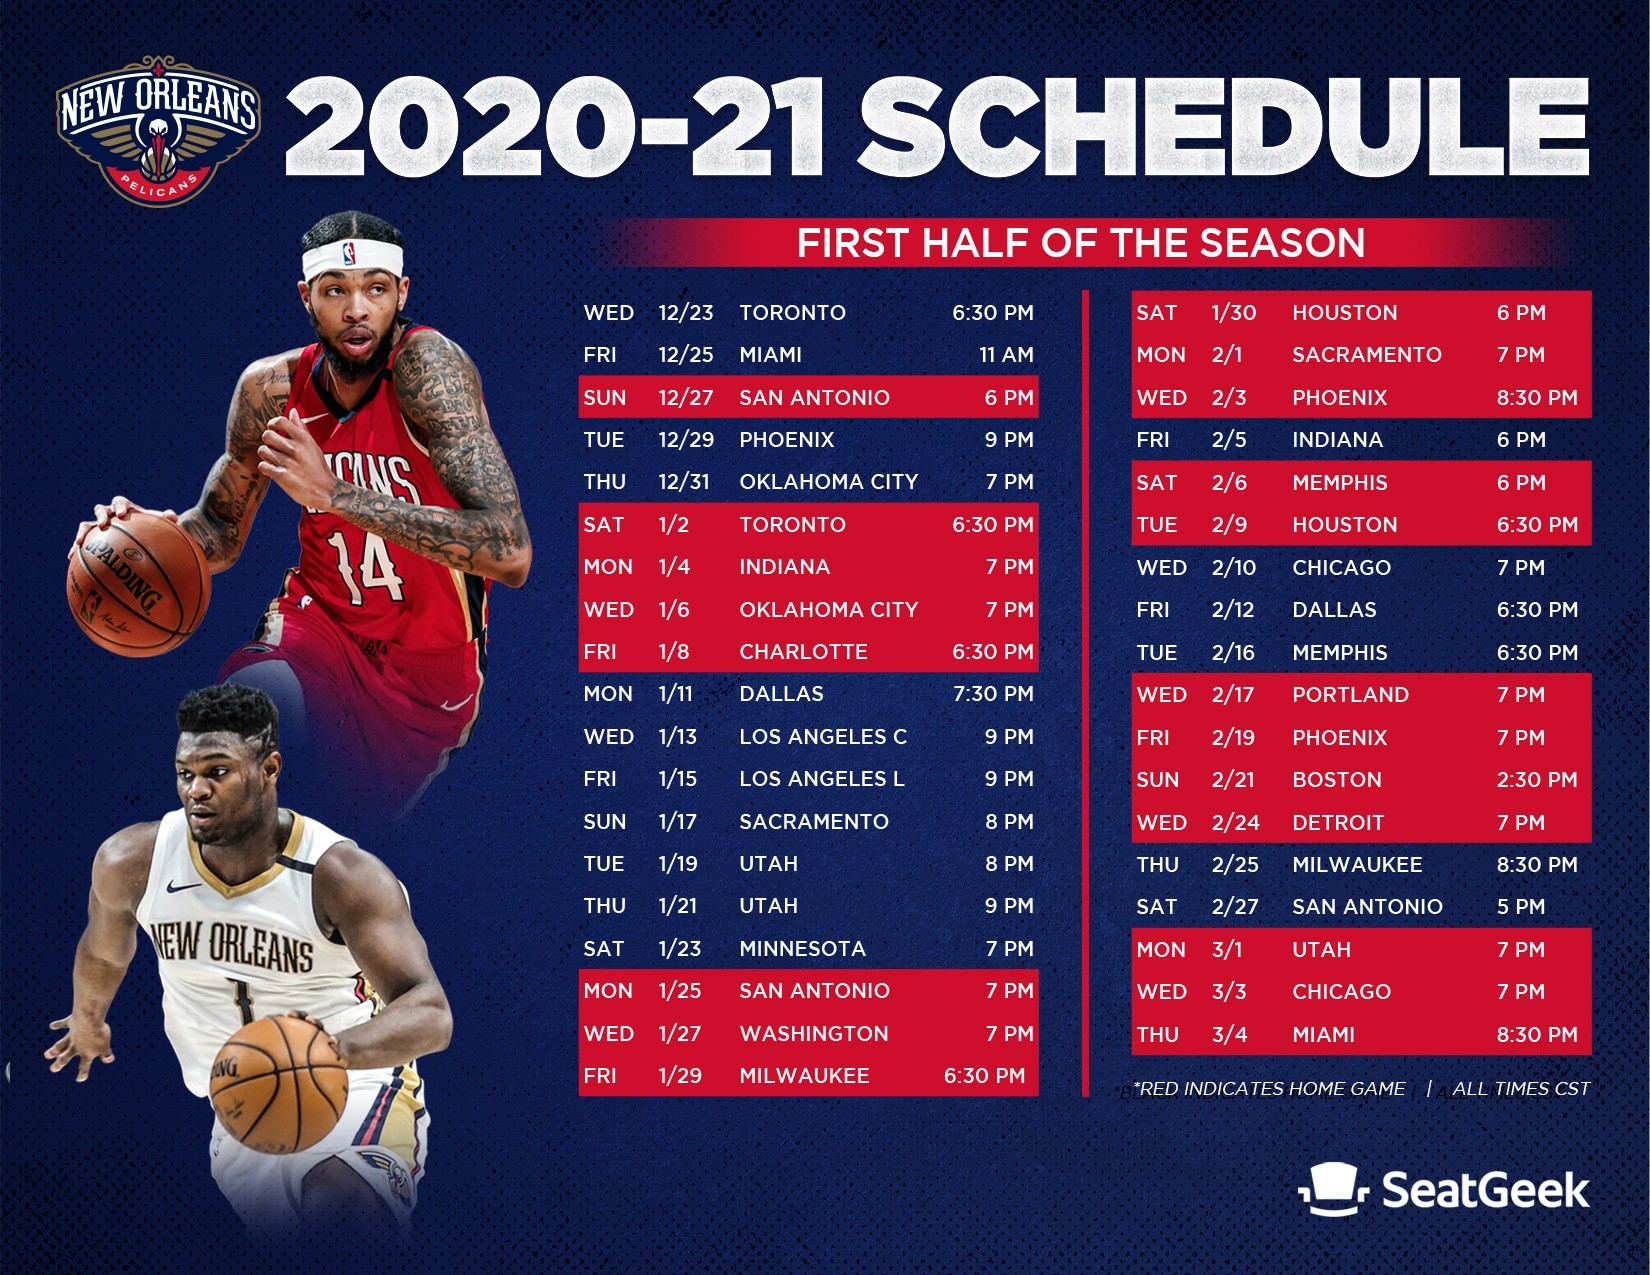 Download A Printable Pelicans 2020-21 Schedule